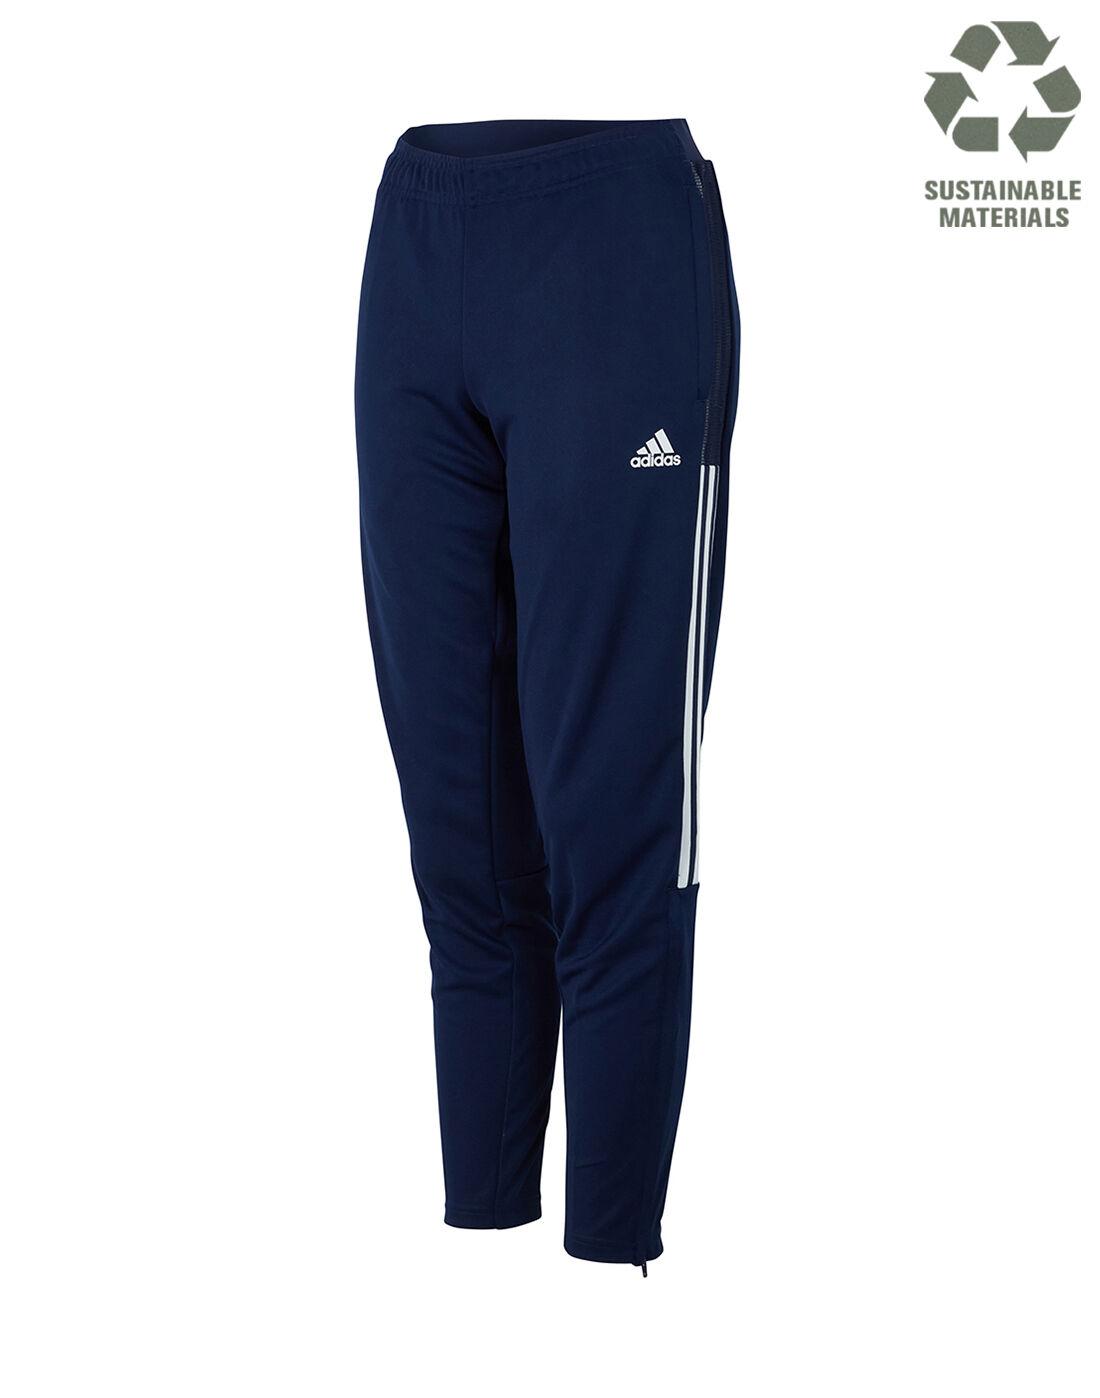 adidas adidas batman gold and grey blue dress shaw | Womens Tiro 21 Training Pants